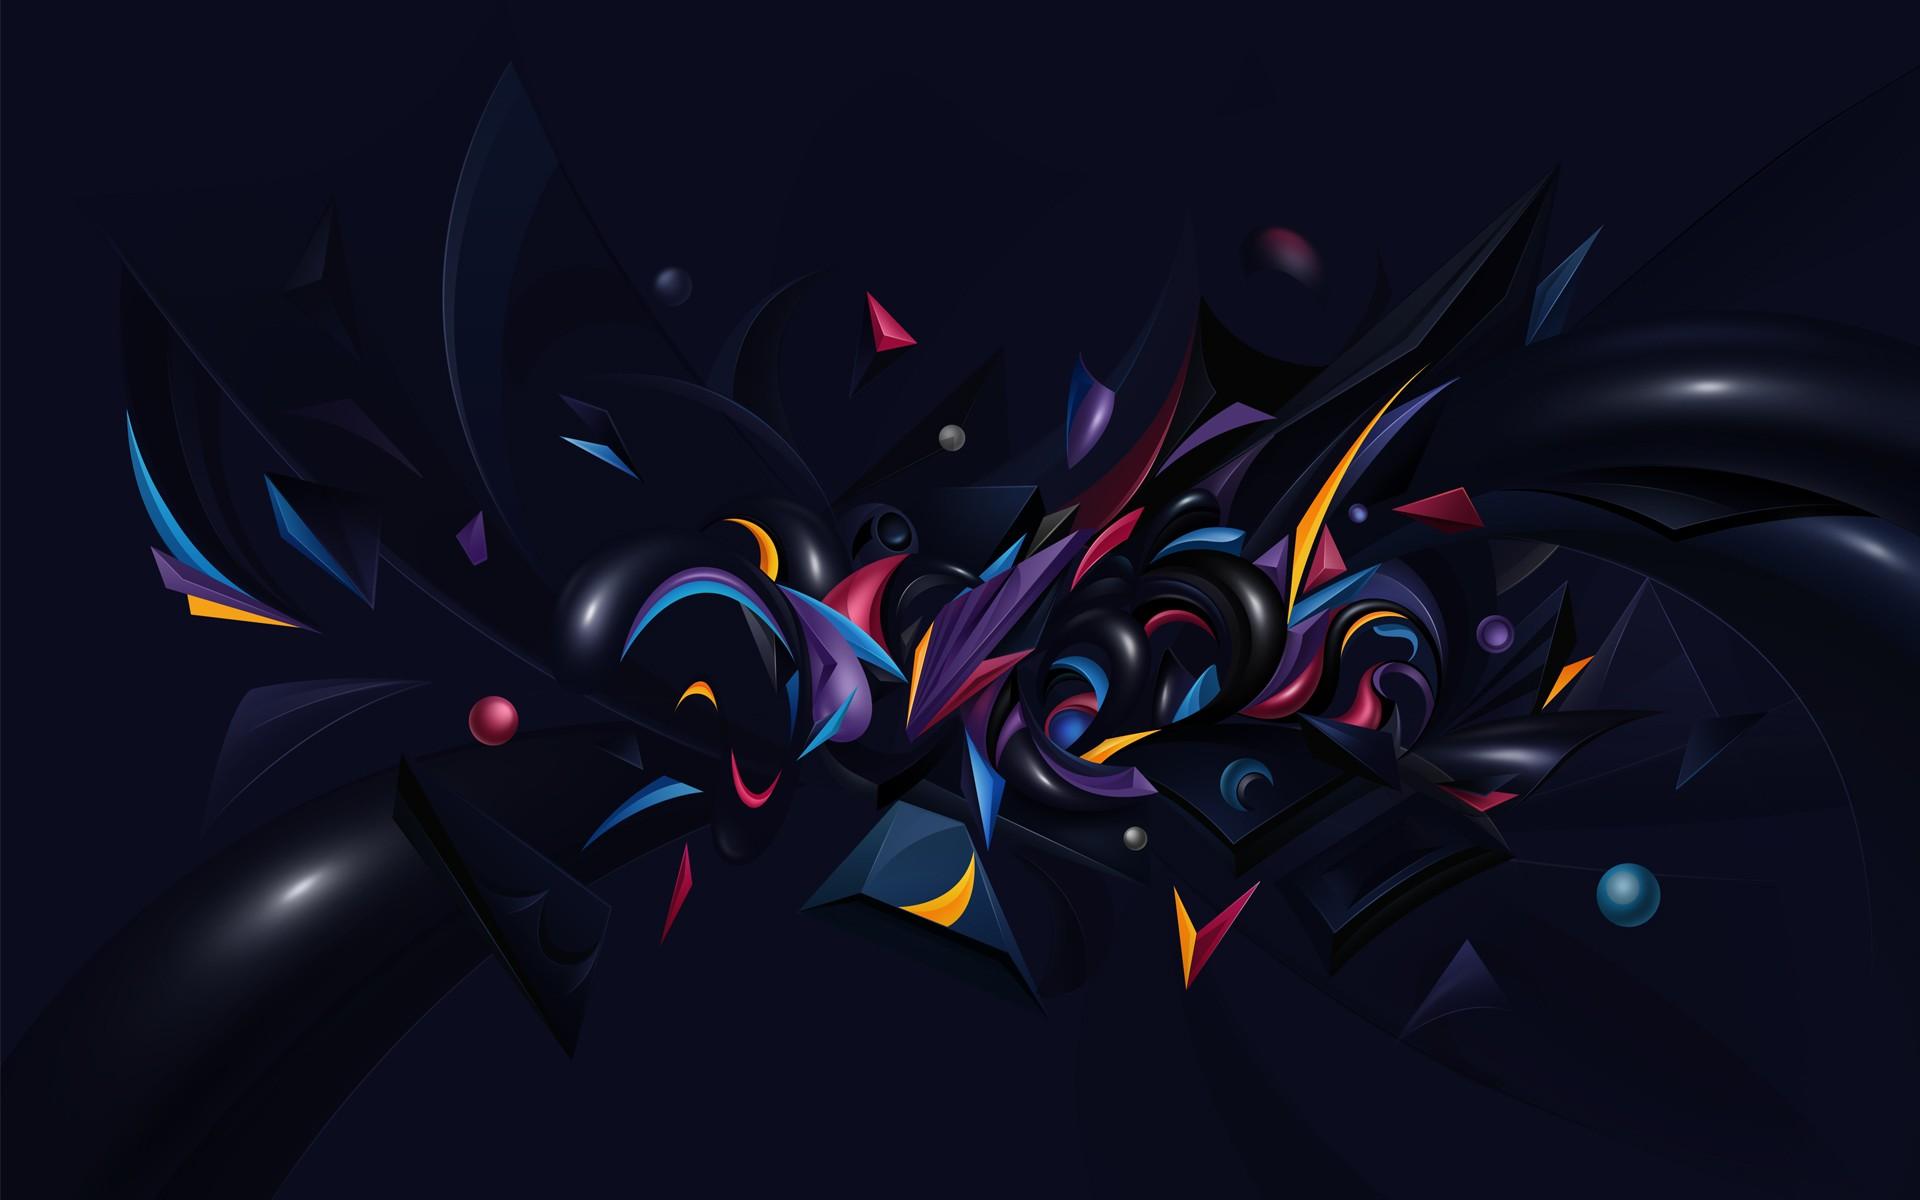 Fullscreen HD Wallpapers Free Download | PixelsTalk Net